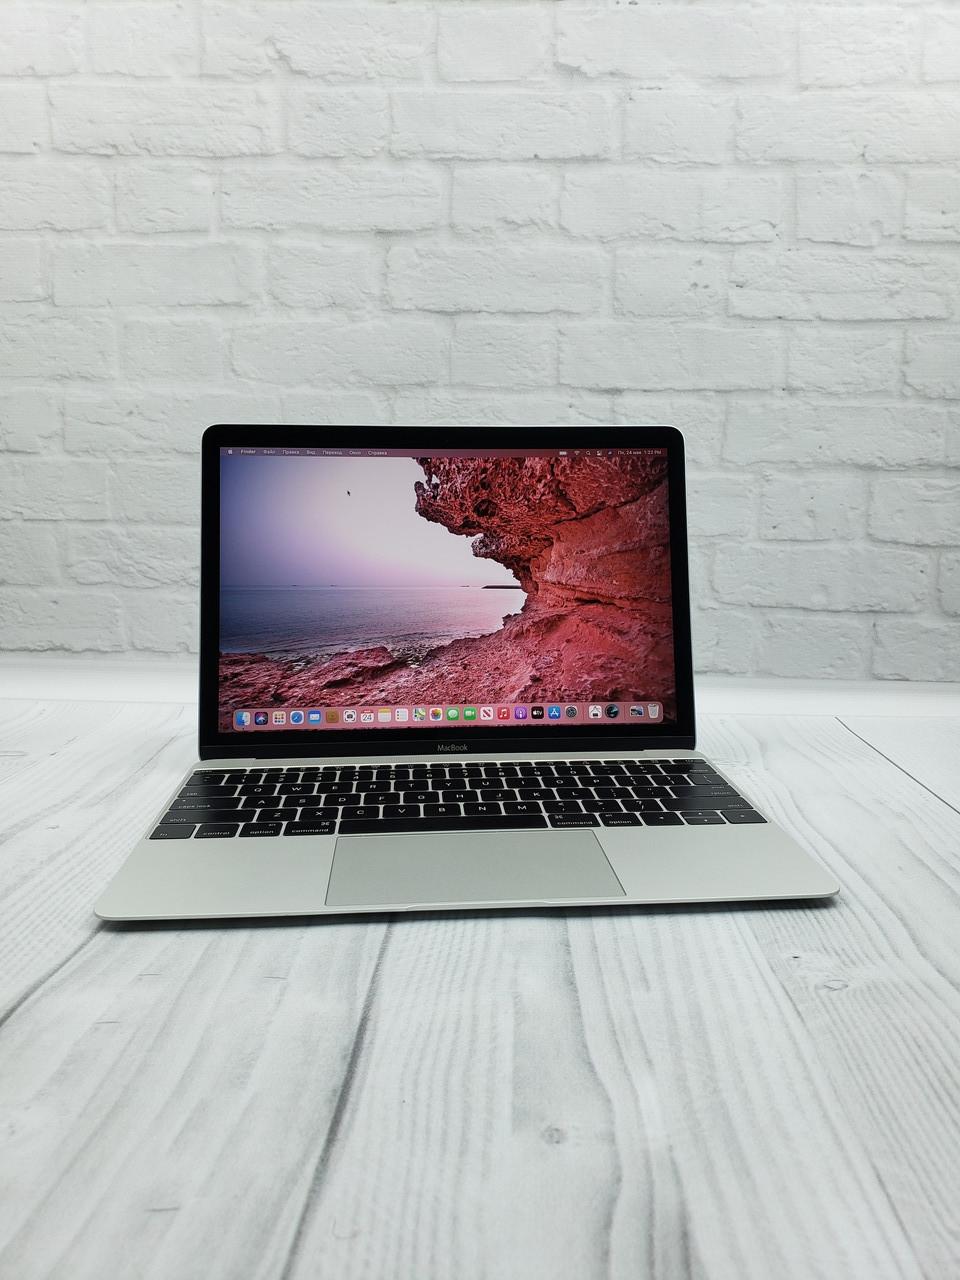 MacBookRetina12'Early2016MLHC2SSD512Gb8Gb RAMМагазин Гарантия